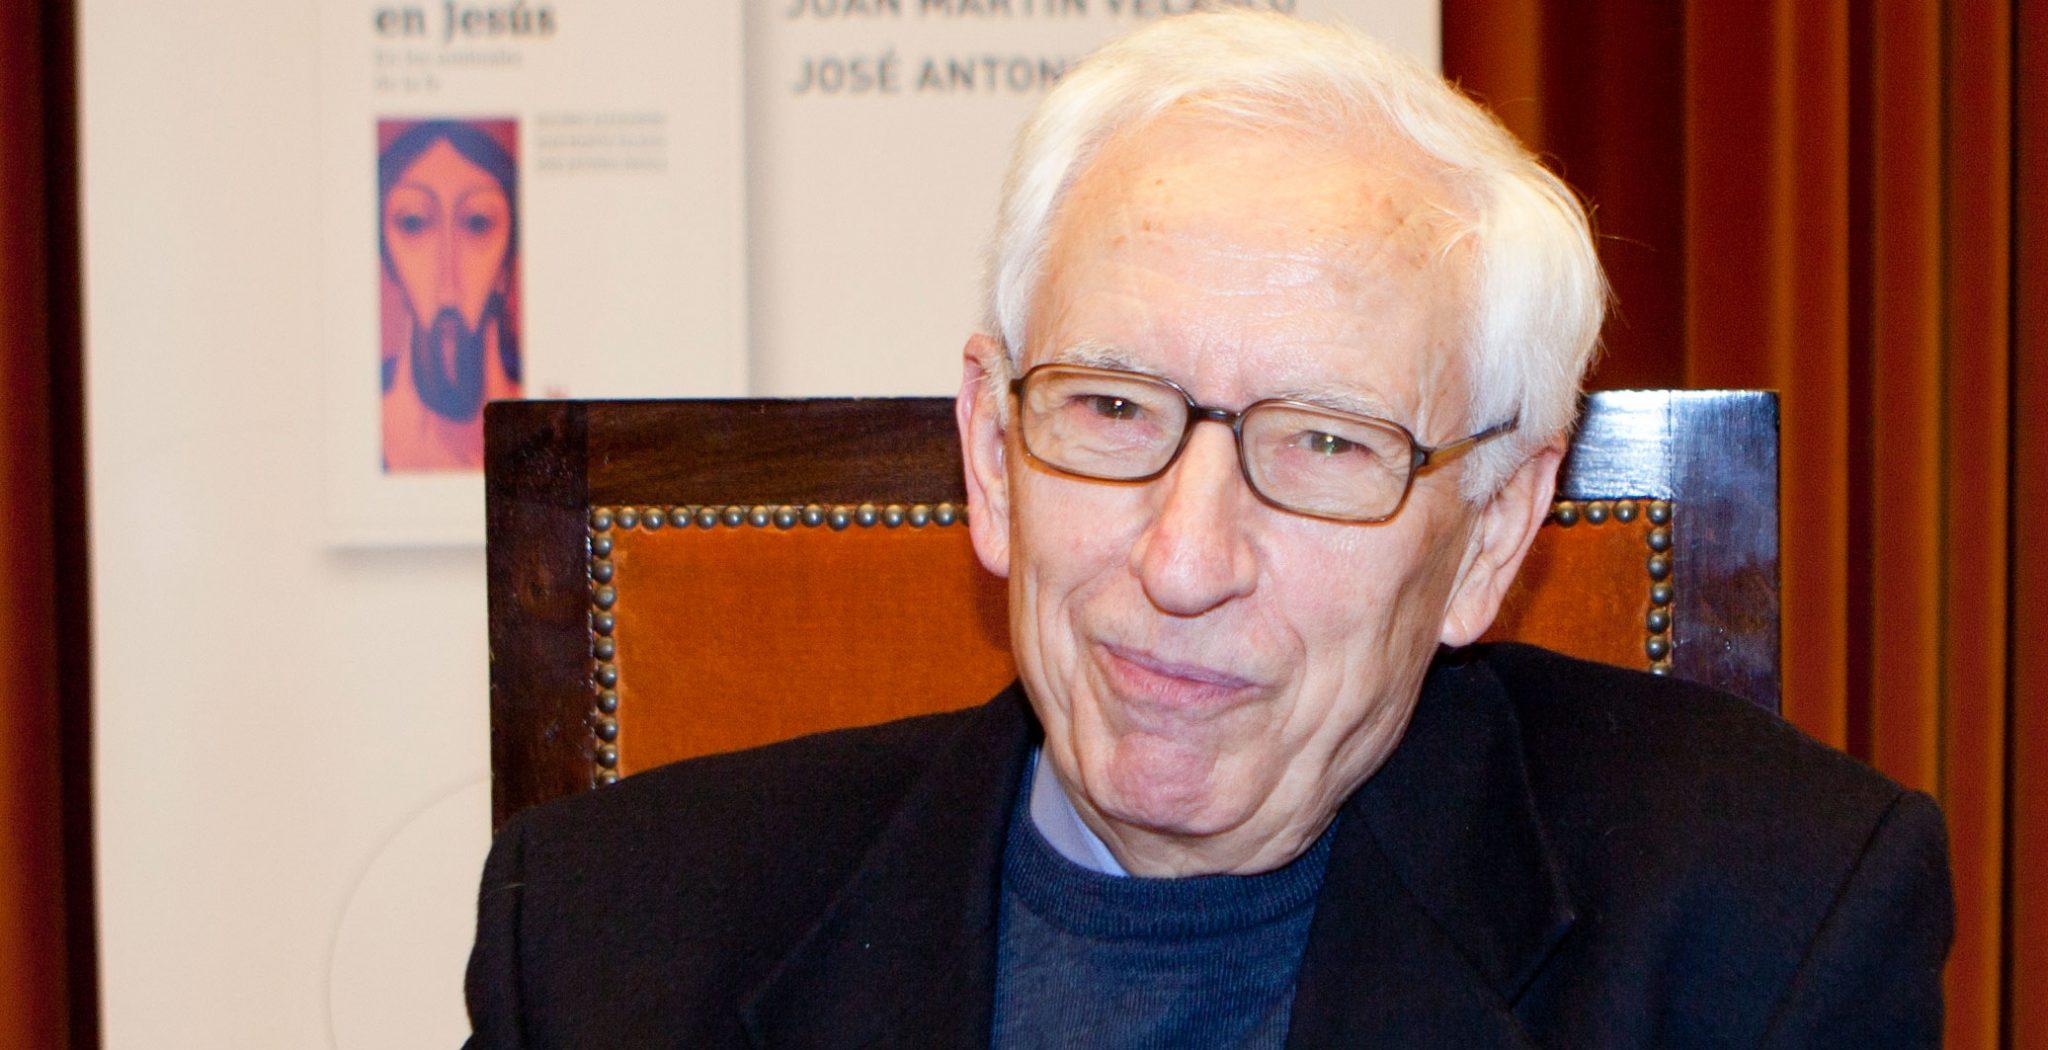 Juan Martín Velasco